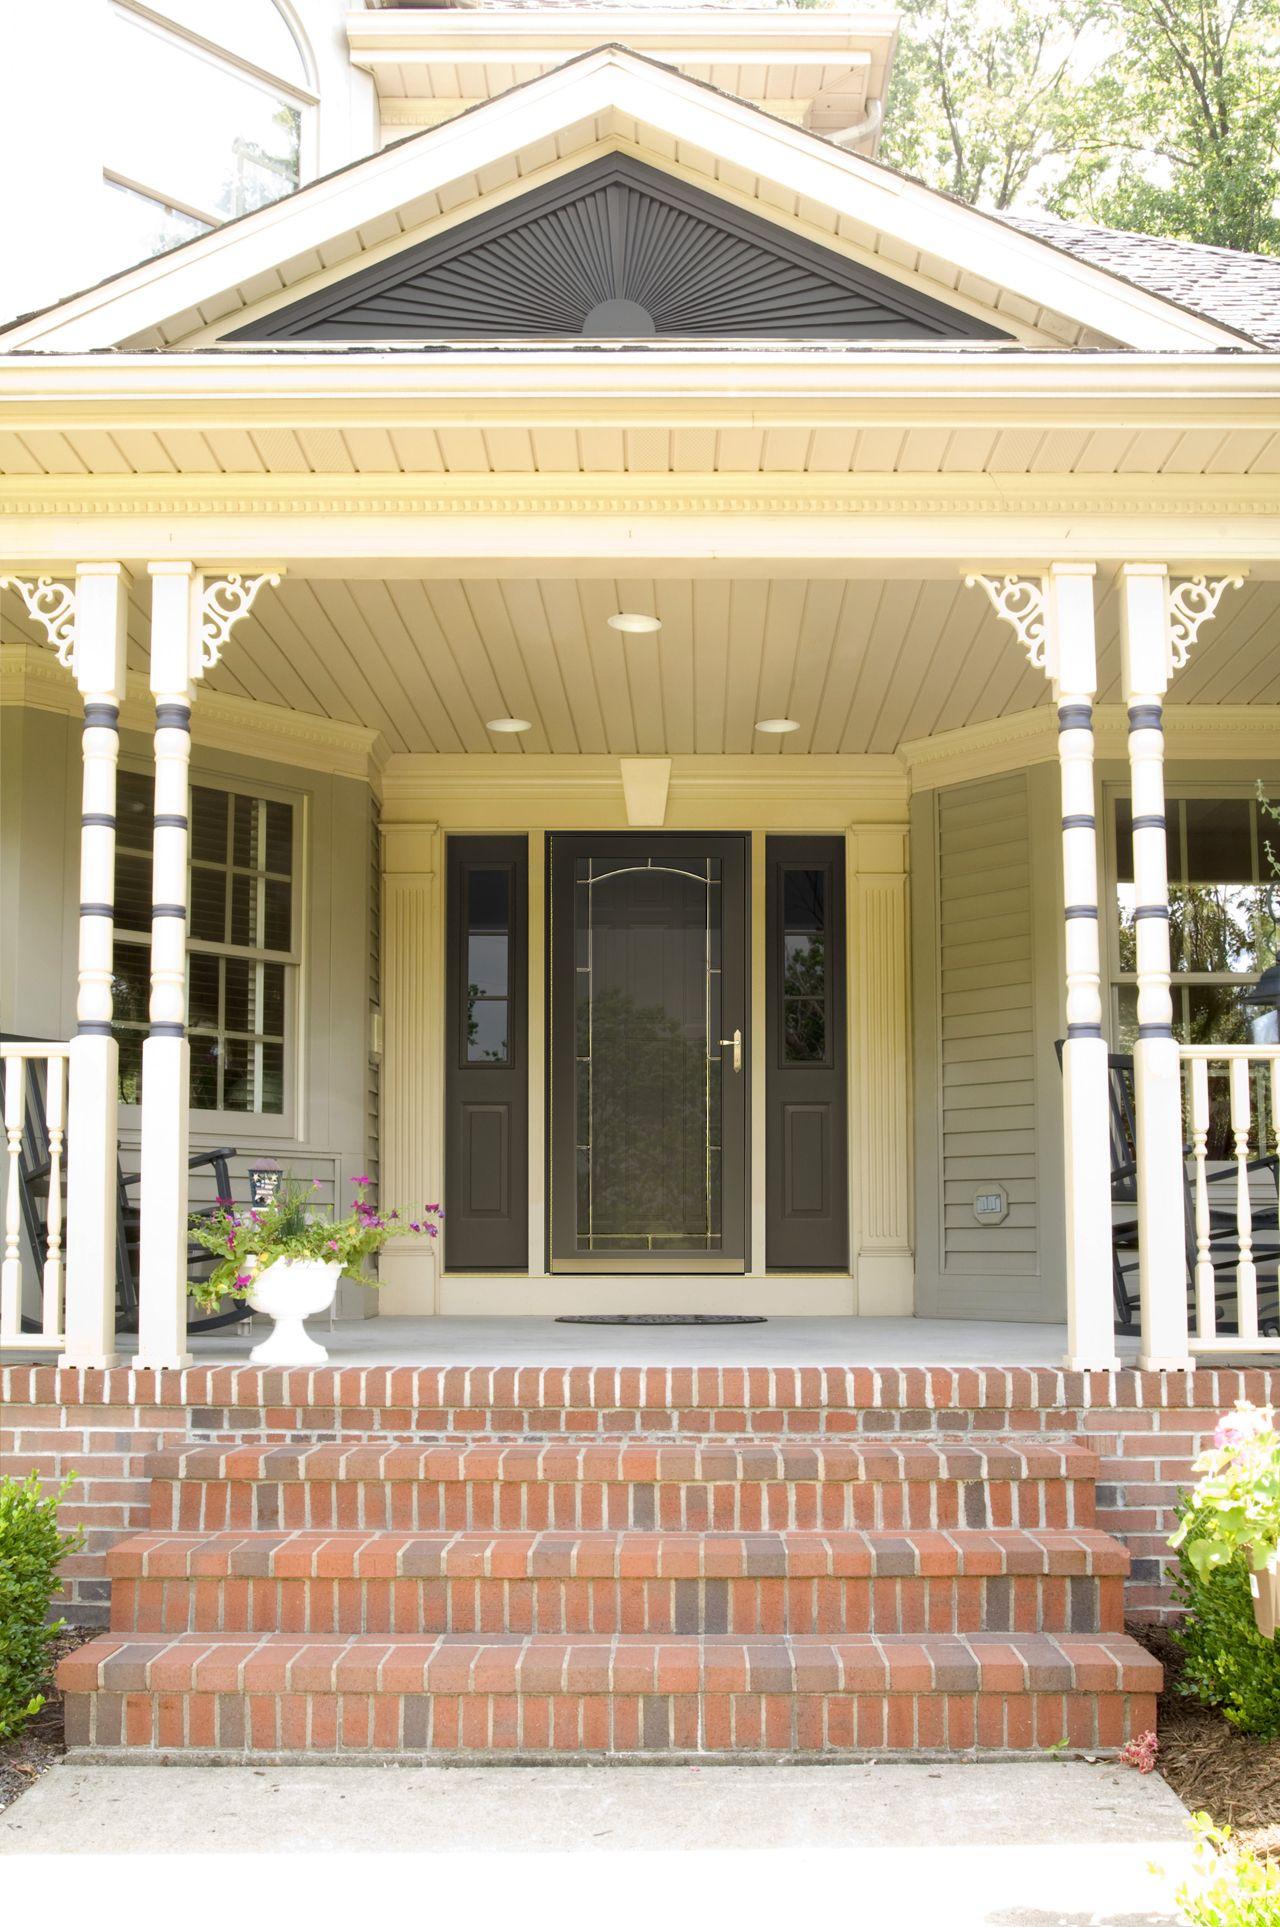 Provia S Decorator Storm Doors Have Multiple Glass Options To Choose From Enabling You To Personalize Your Door To Match Your Aluminum Storm Doors Doors Entry Doors